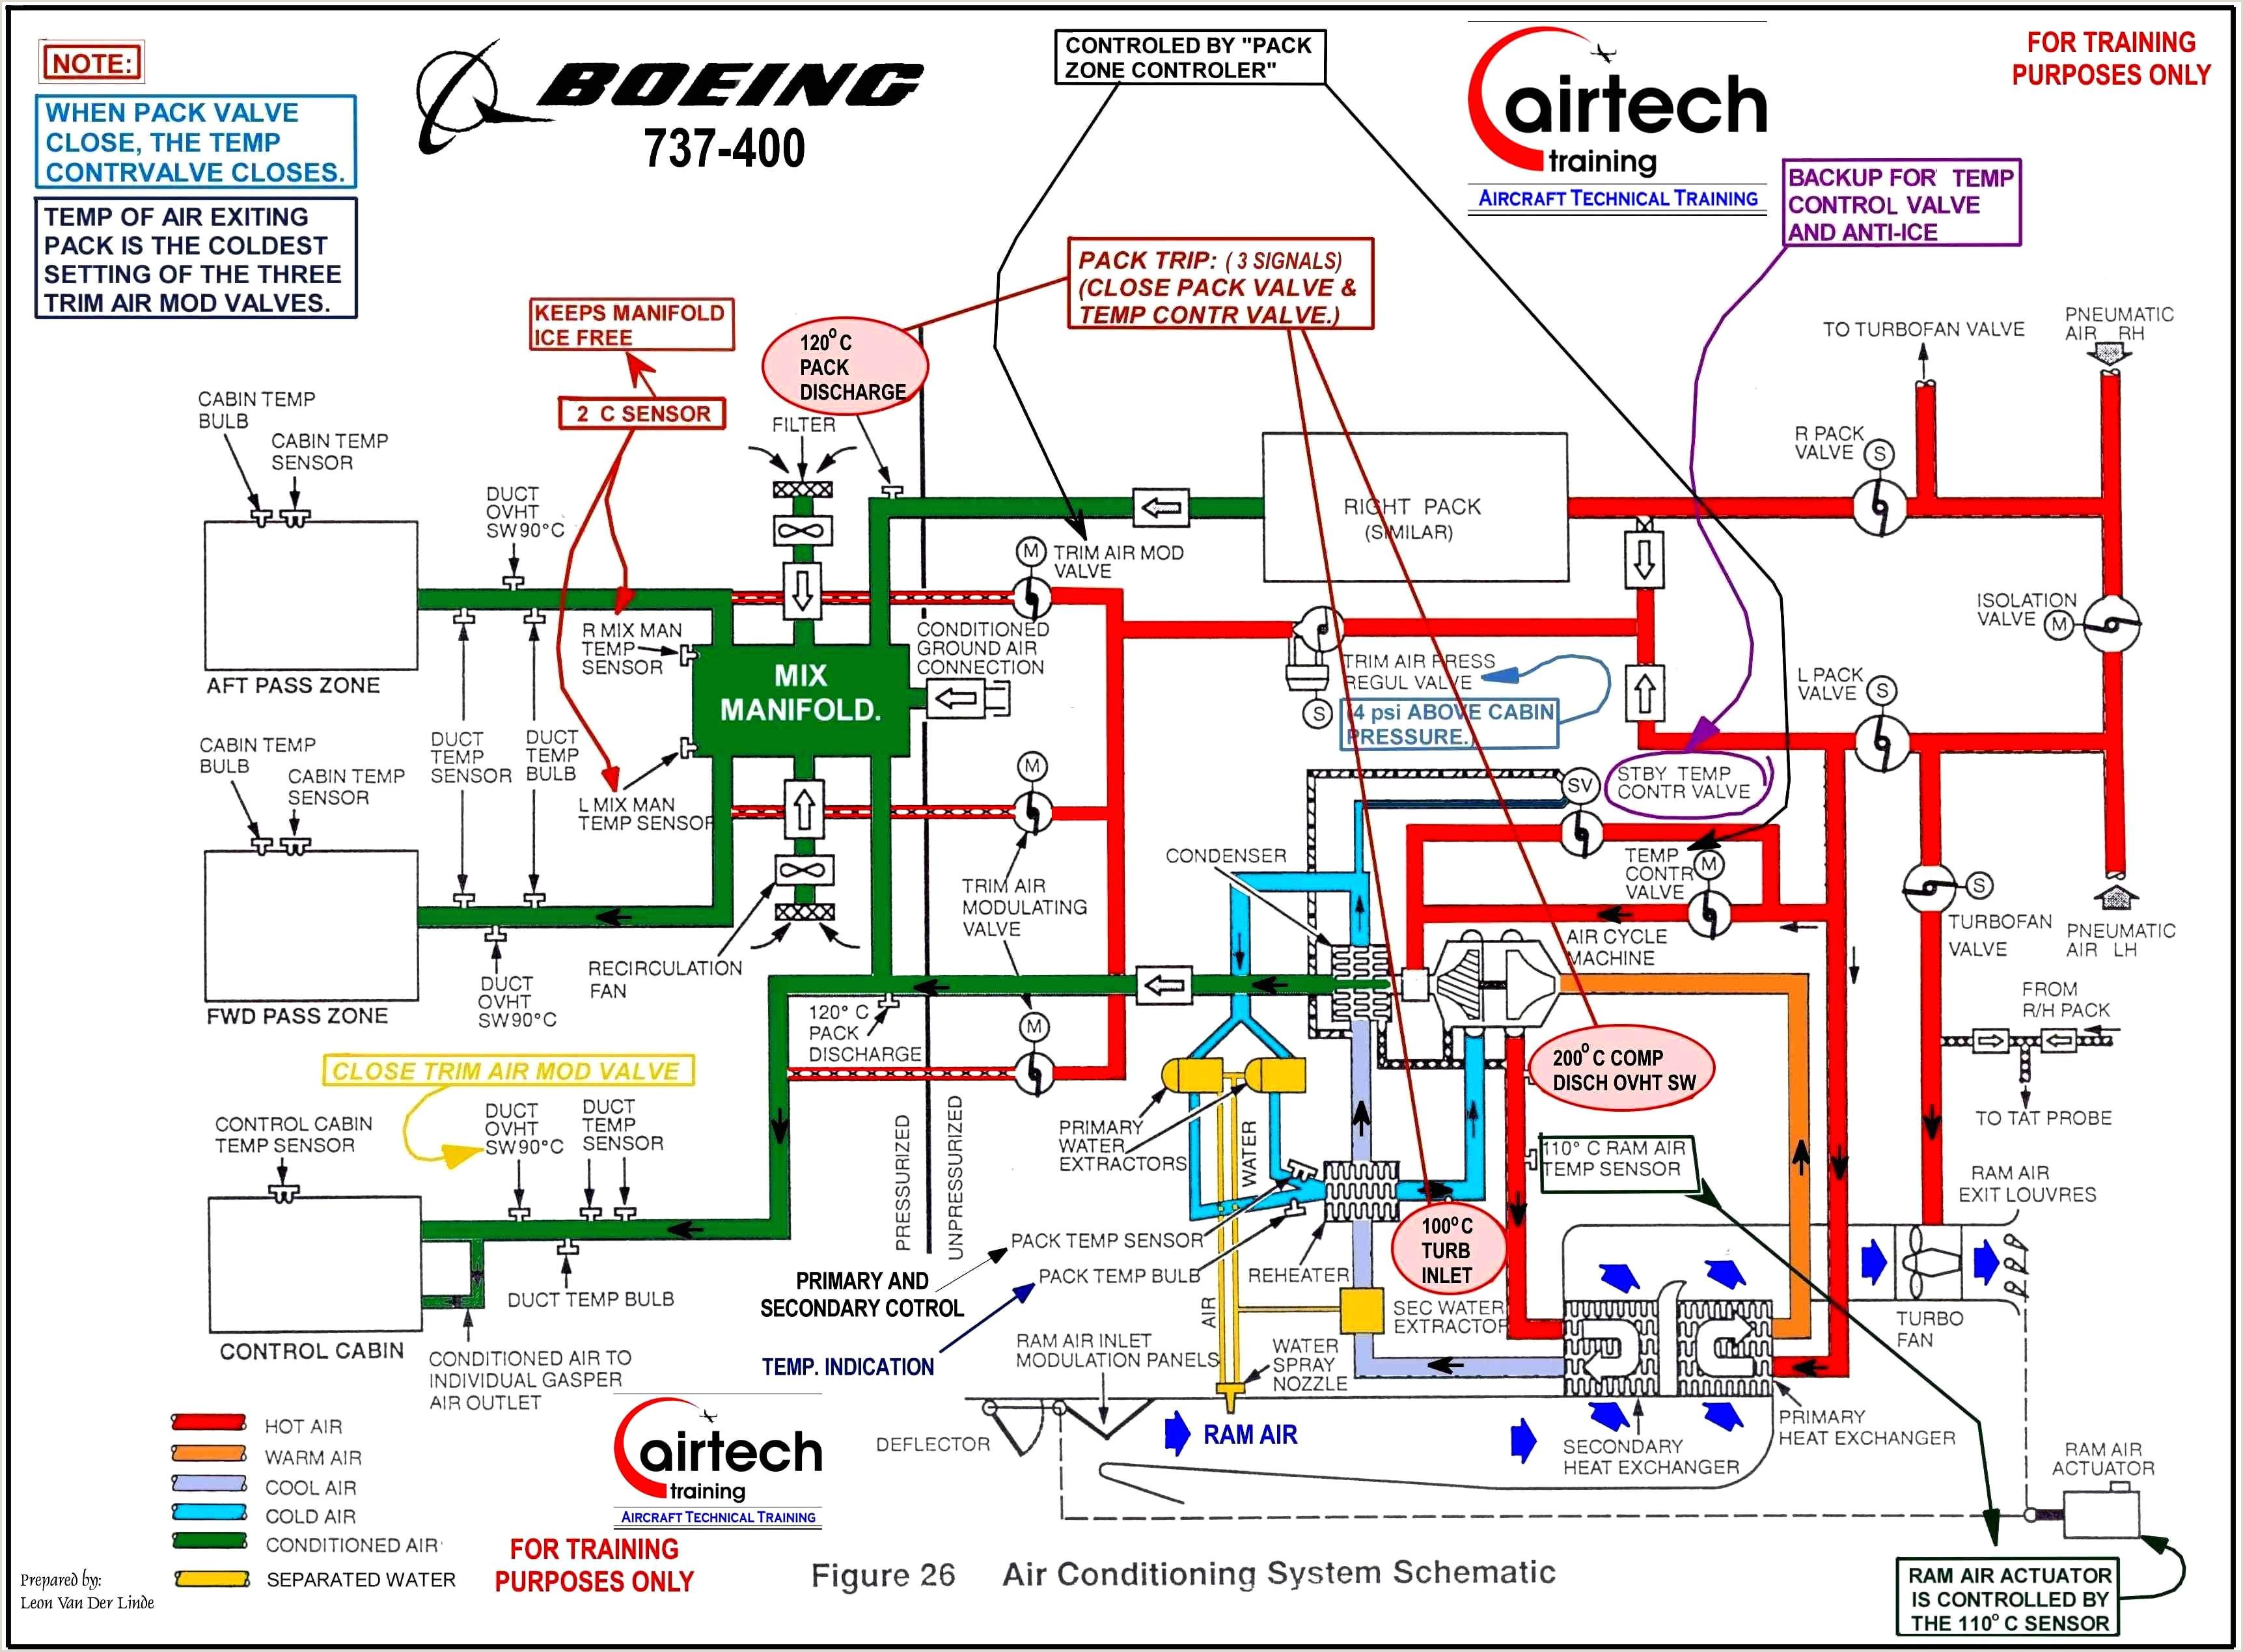 Boeing Wiring Diagrams Wiring Diagram Document Guide